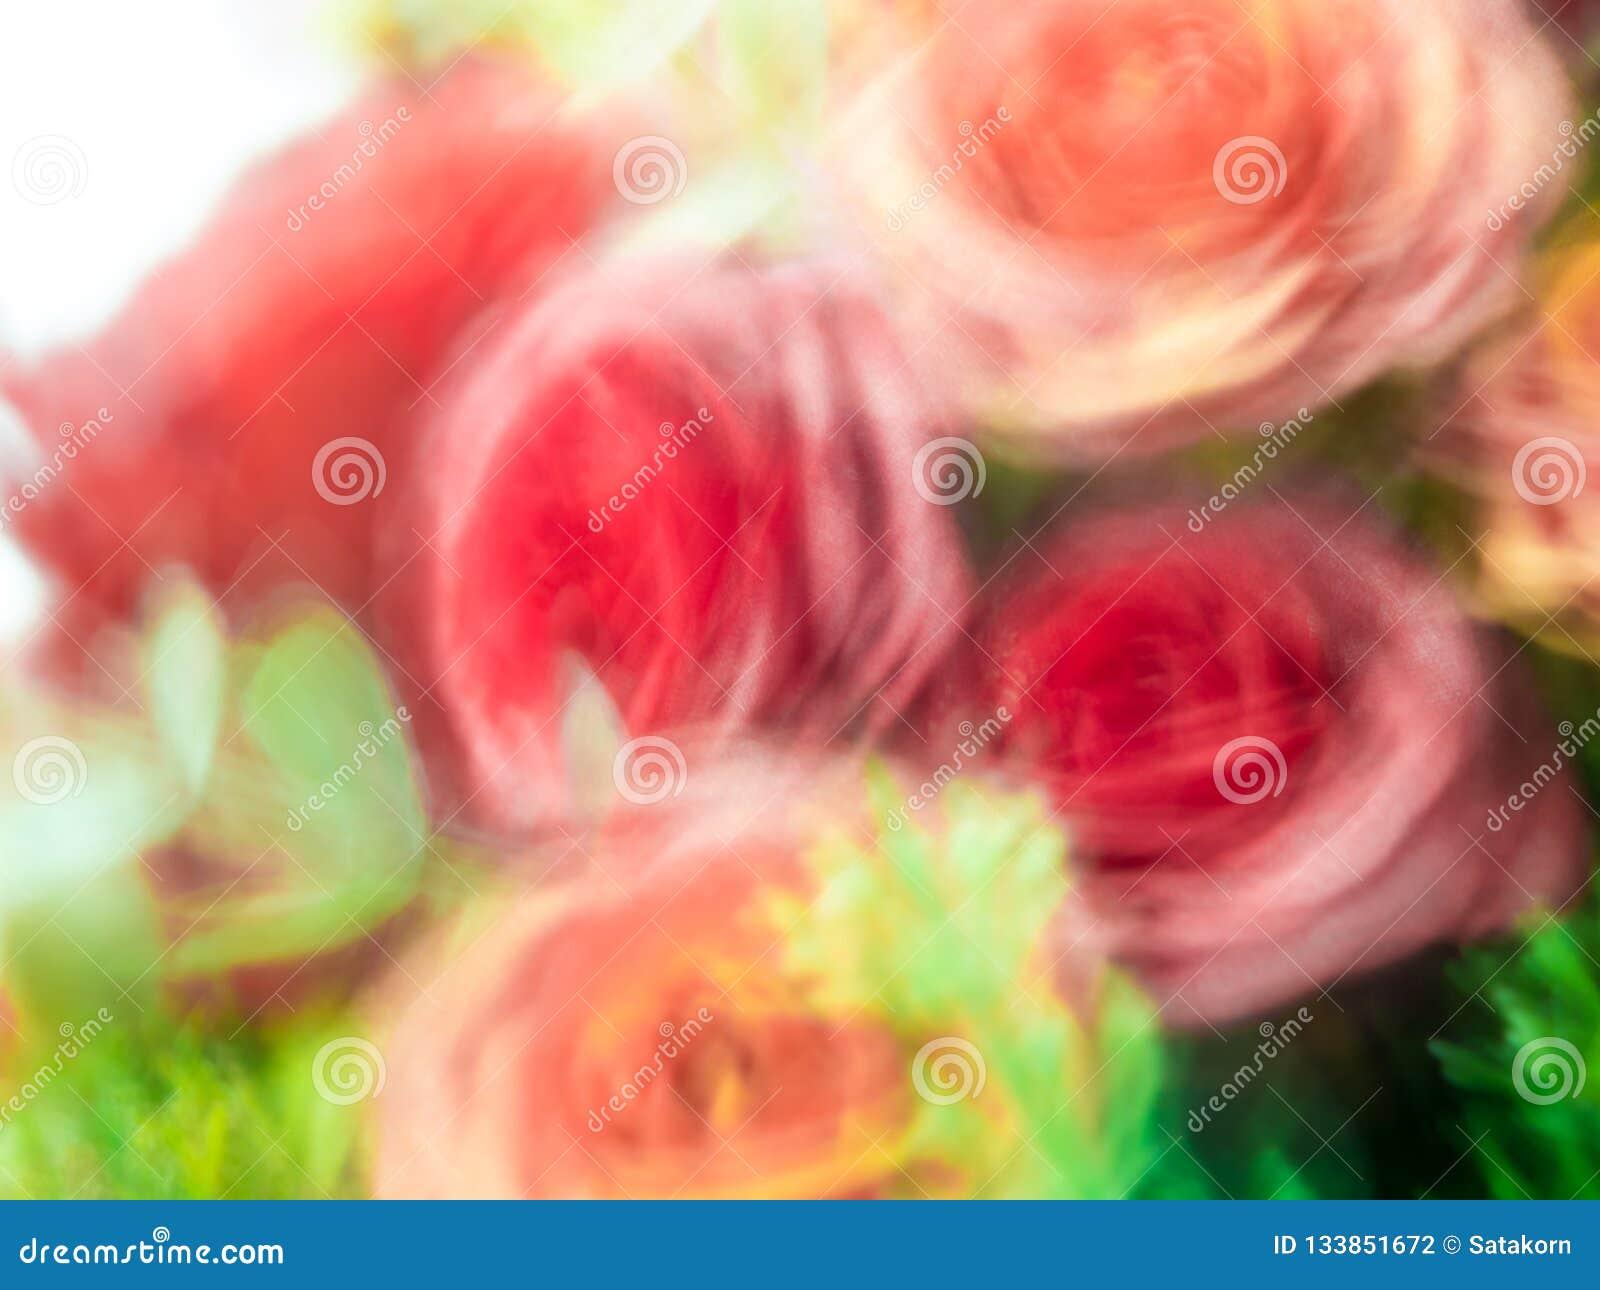 Blur flowers in artificial flower bouquet